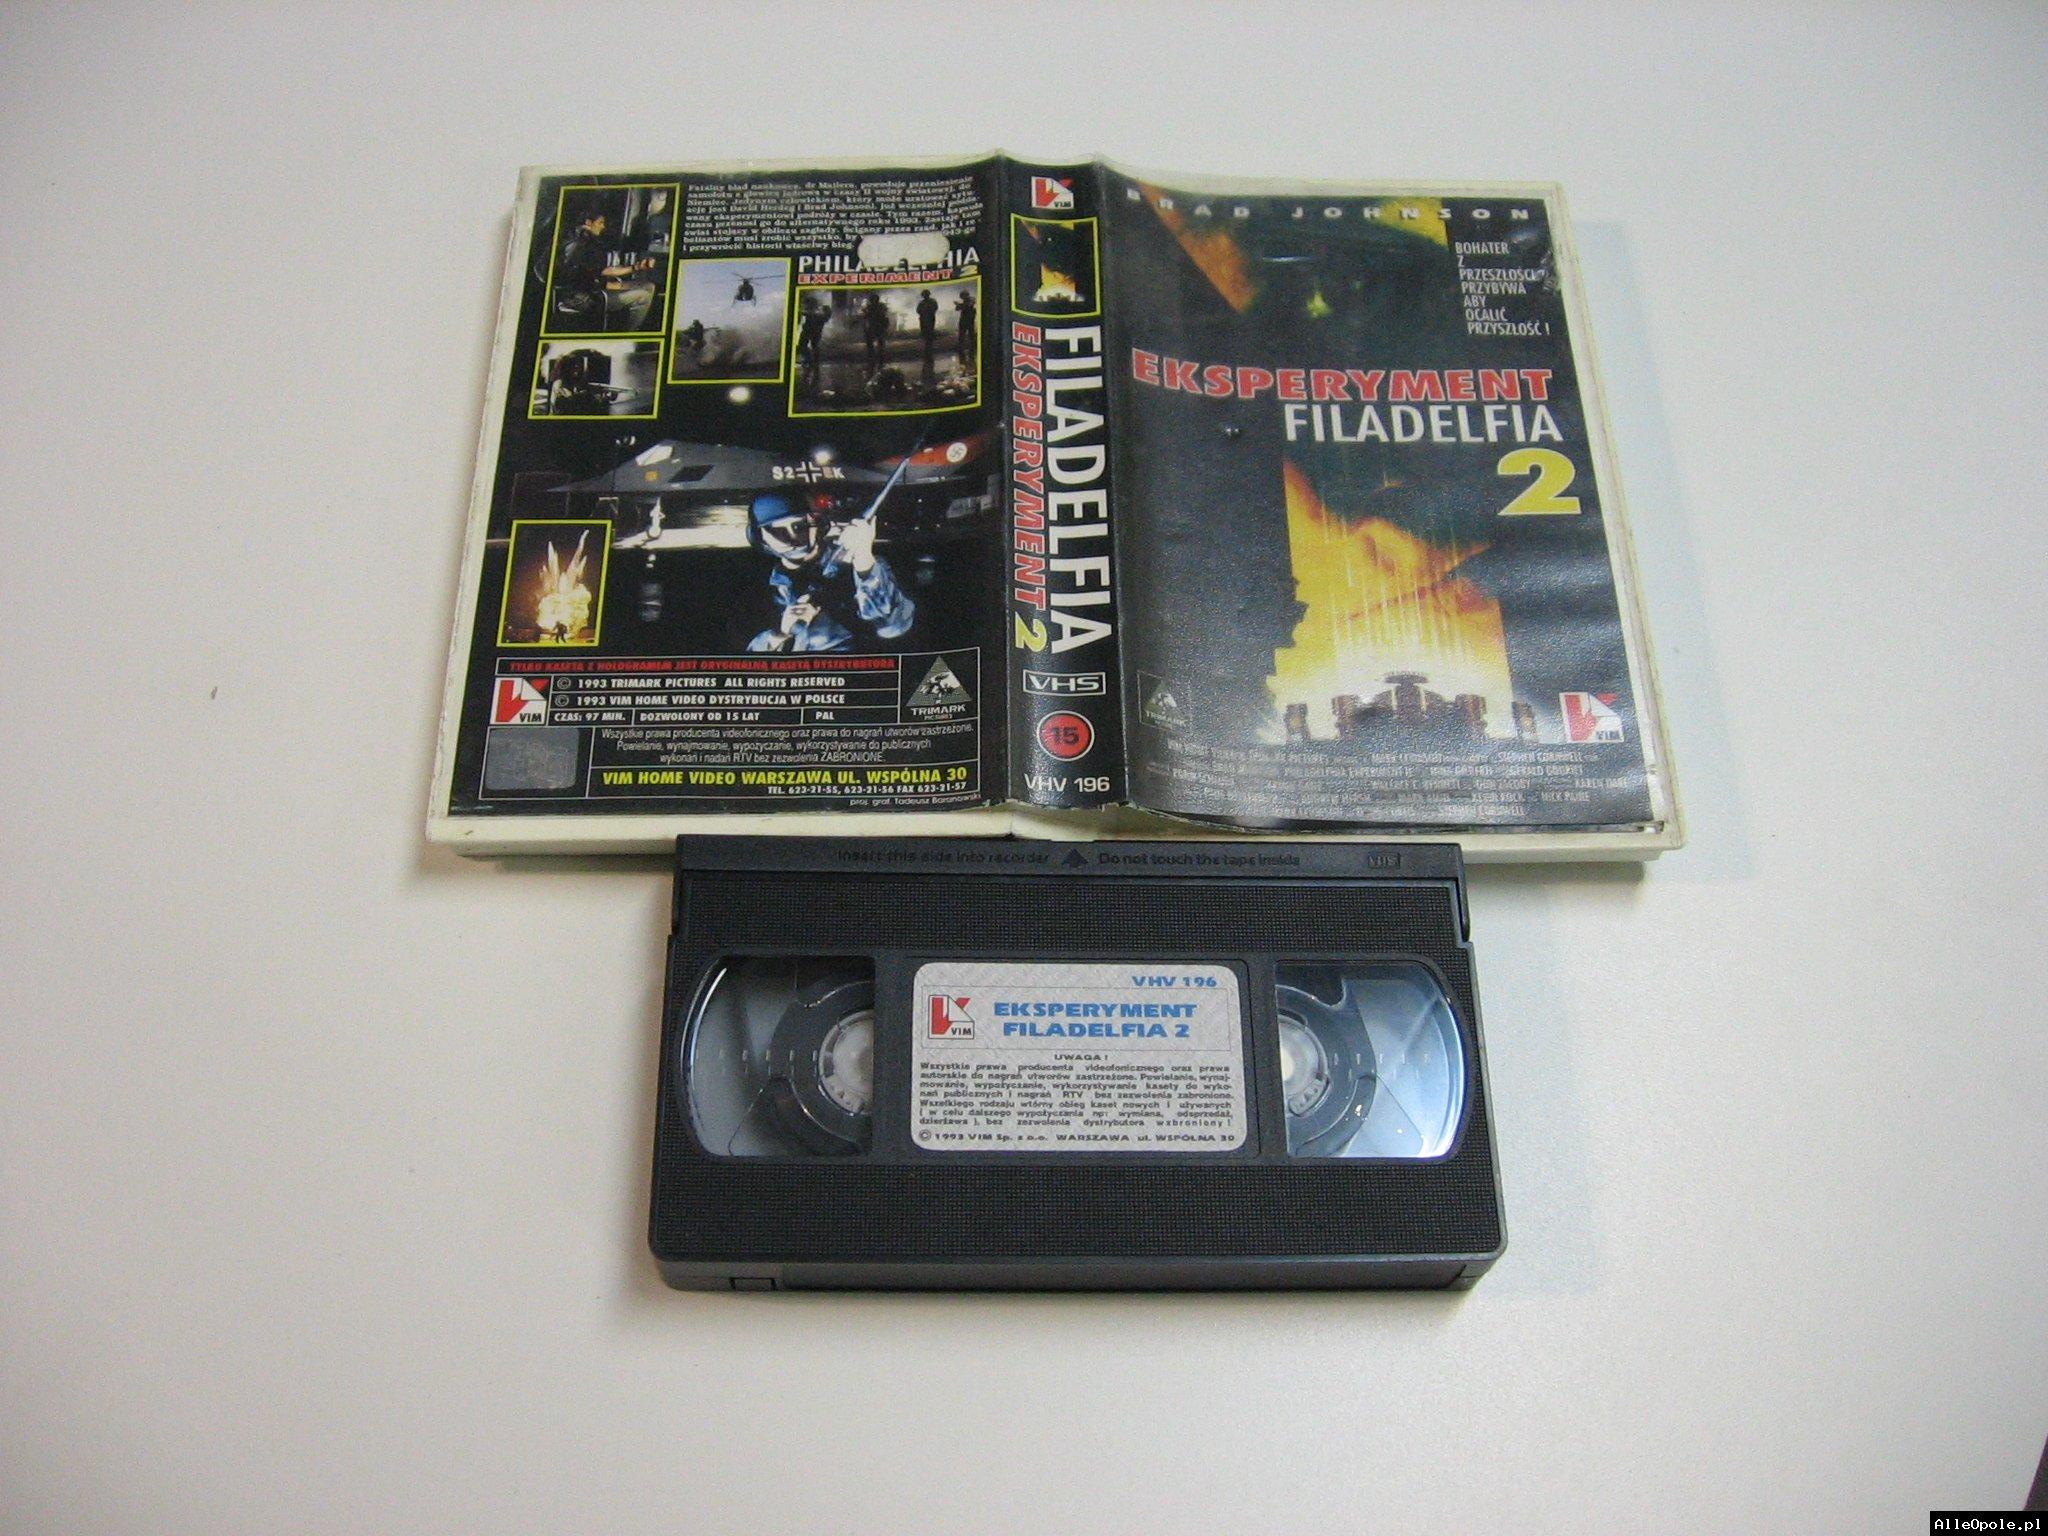 FILADELFIA 2 - VHS Kaseta Video - Opole 1816